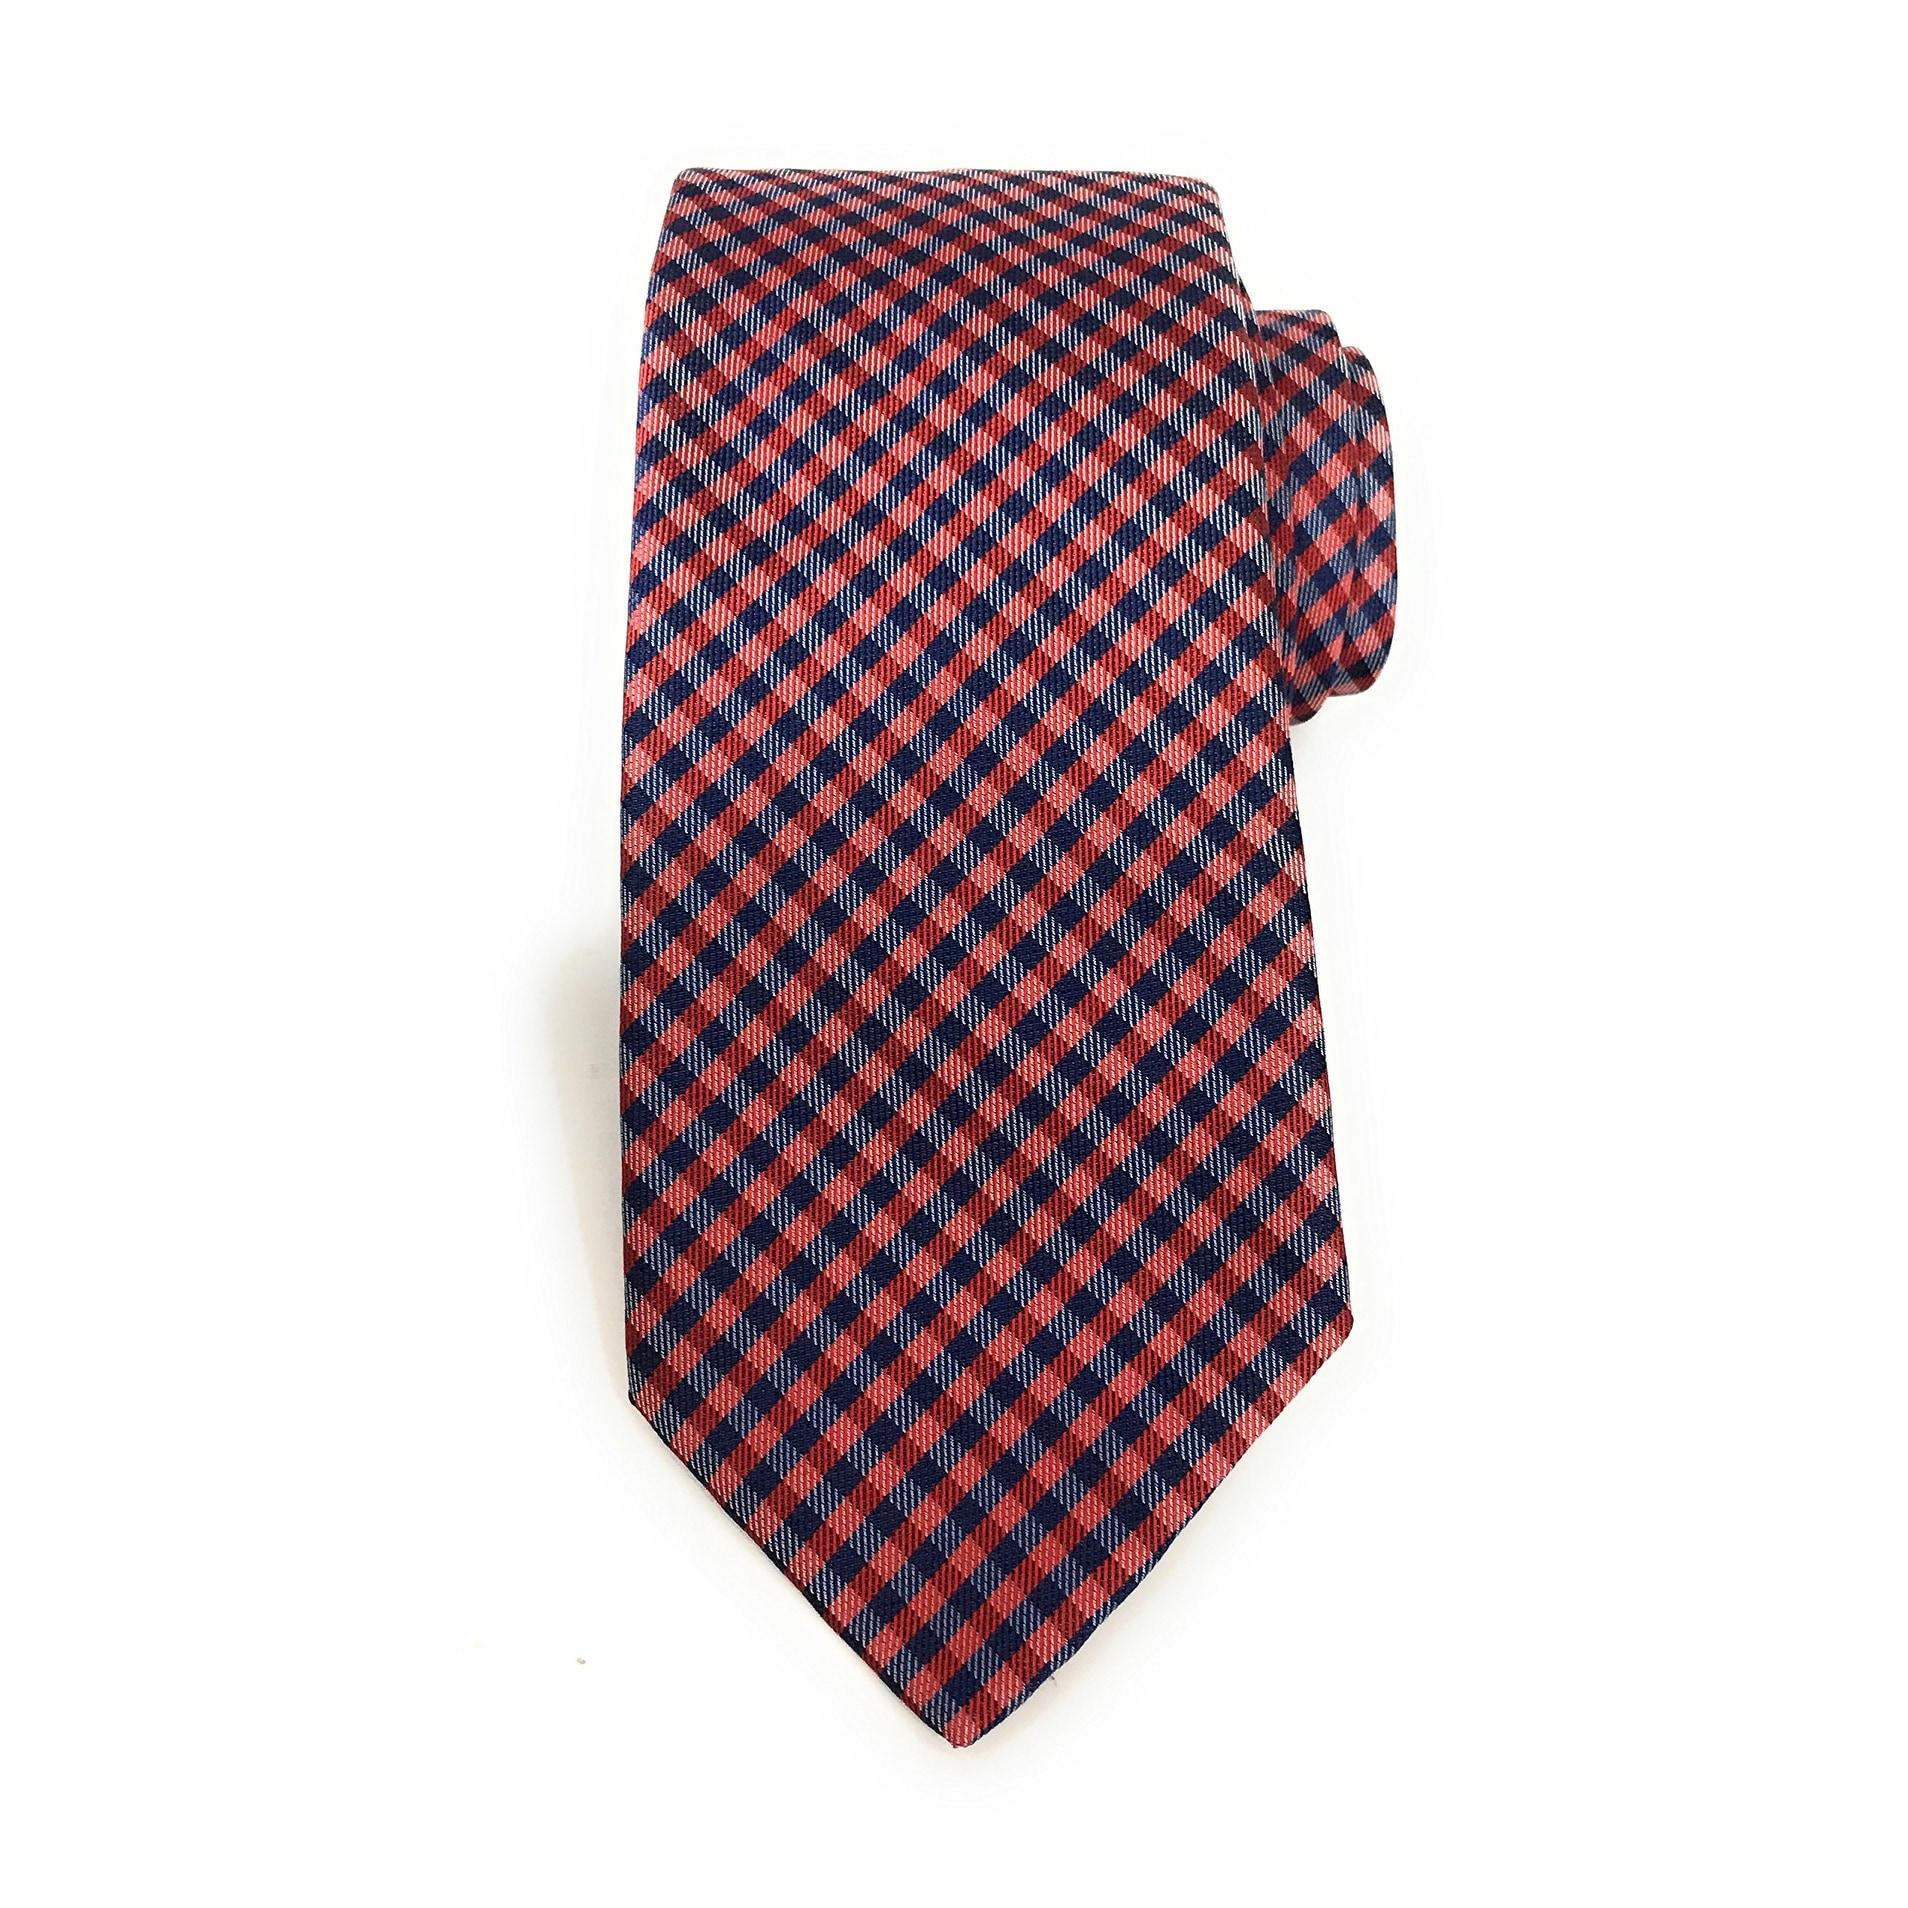 e62e36954 ... coupon for shop boss hugo boss new red blue mens one size gingham  skinny neck tie